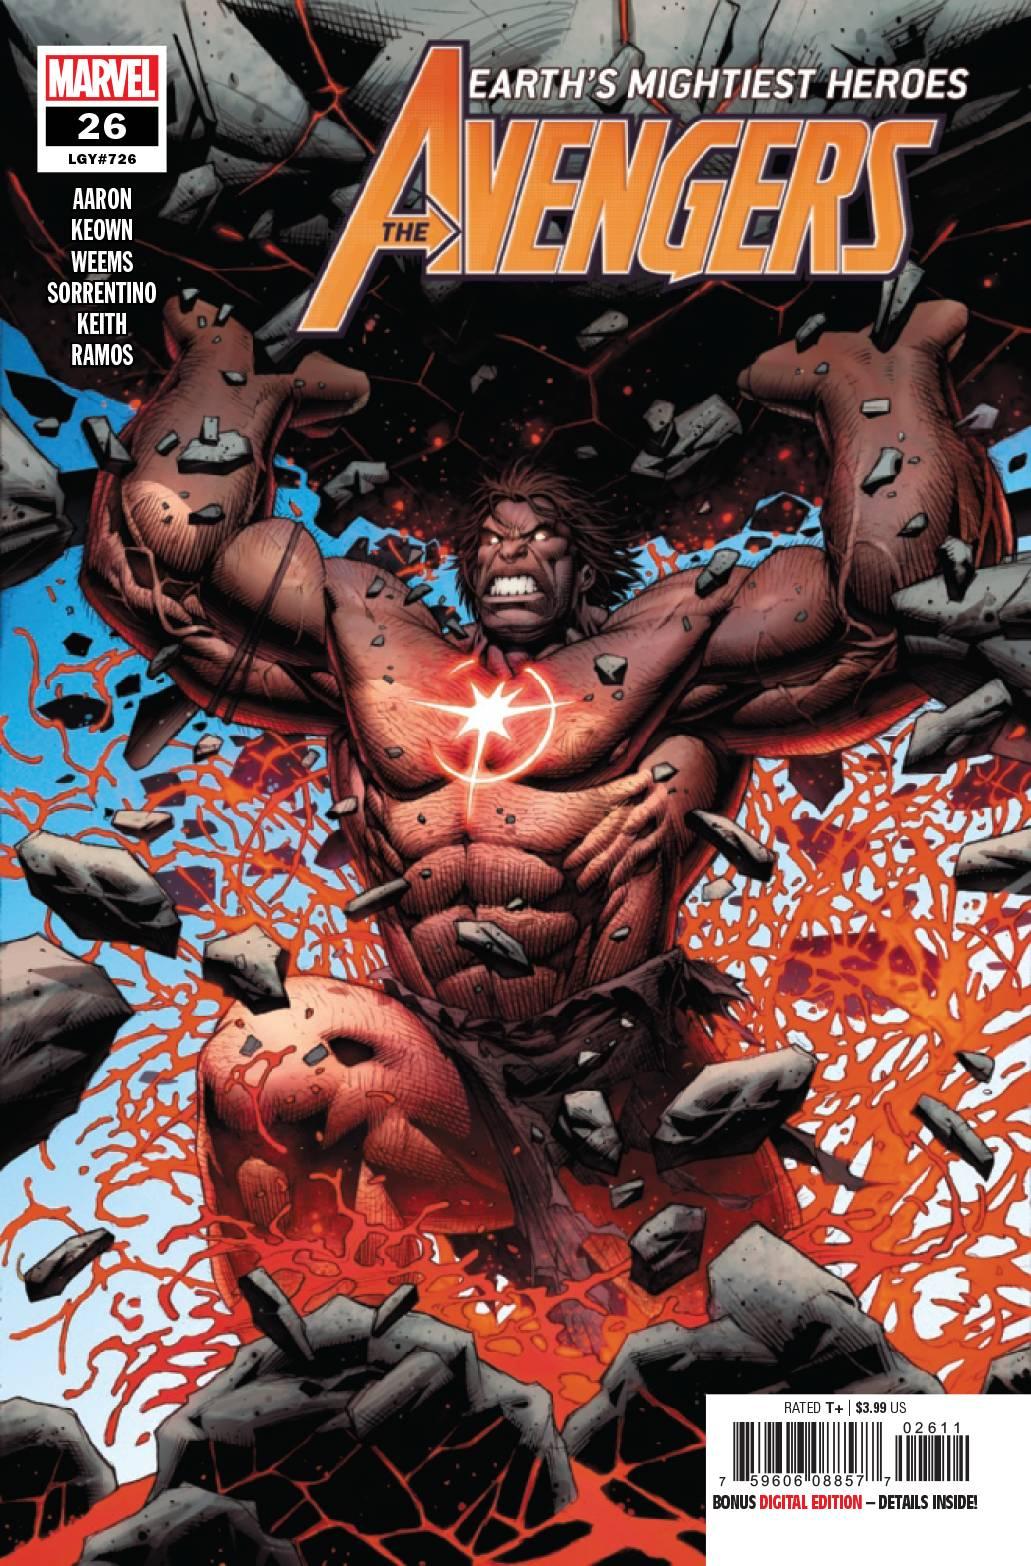 Avengers: Earth's Mightiest Heroes #26 (2019)